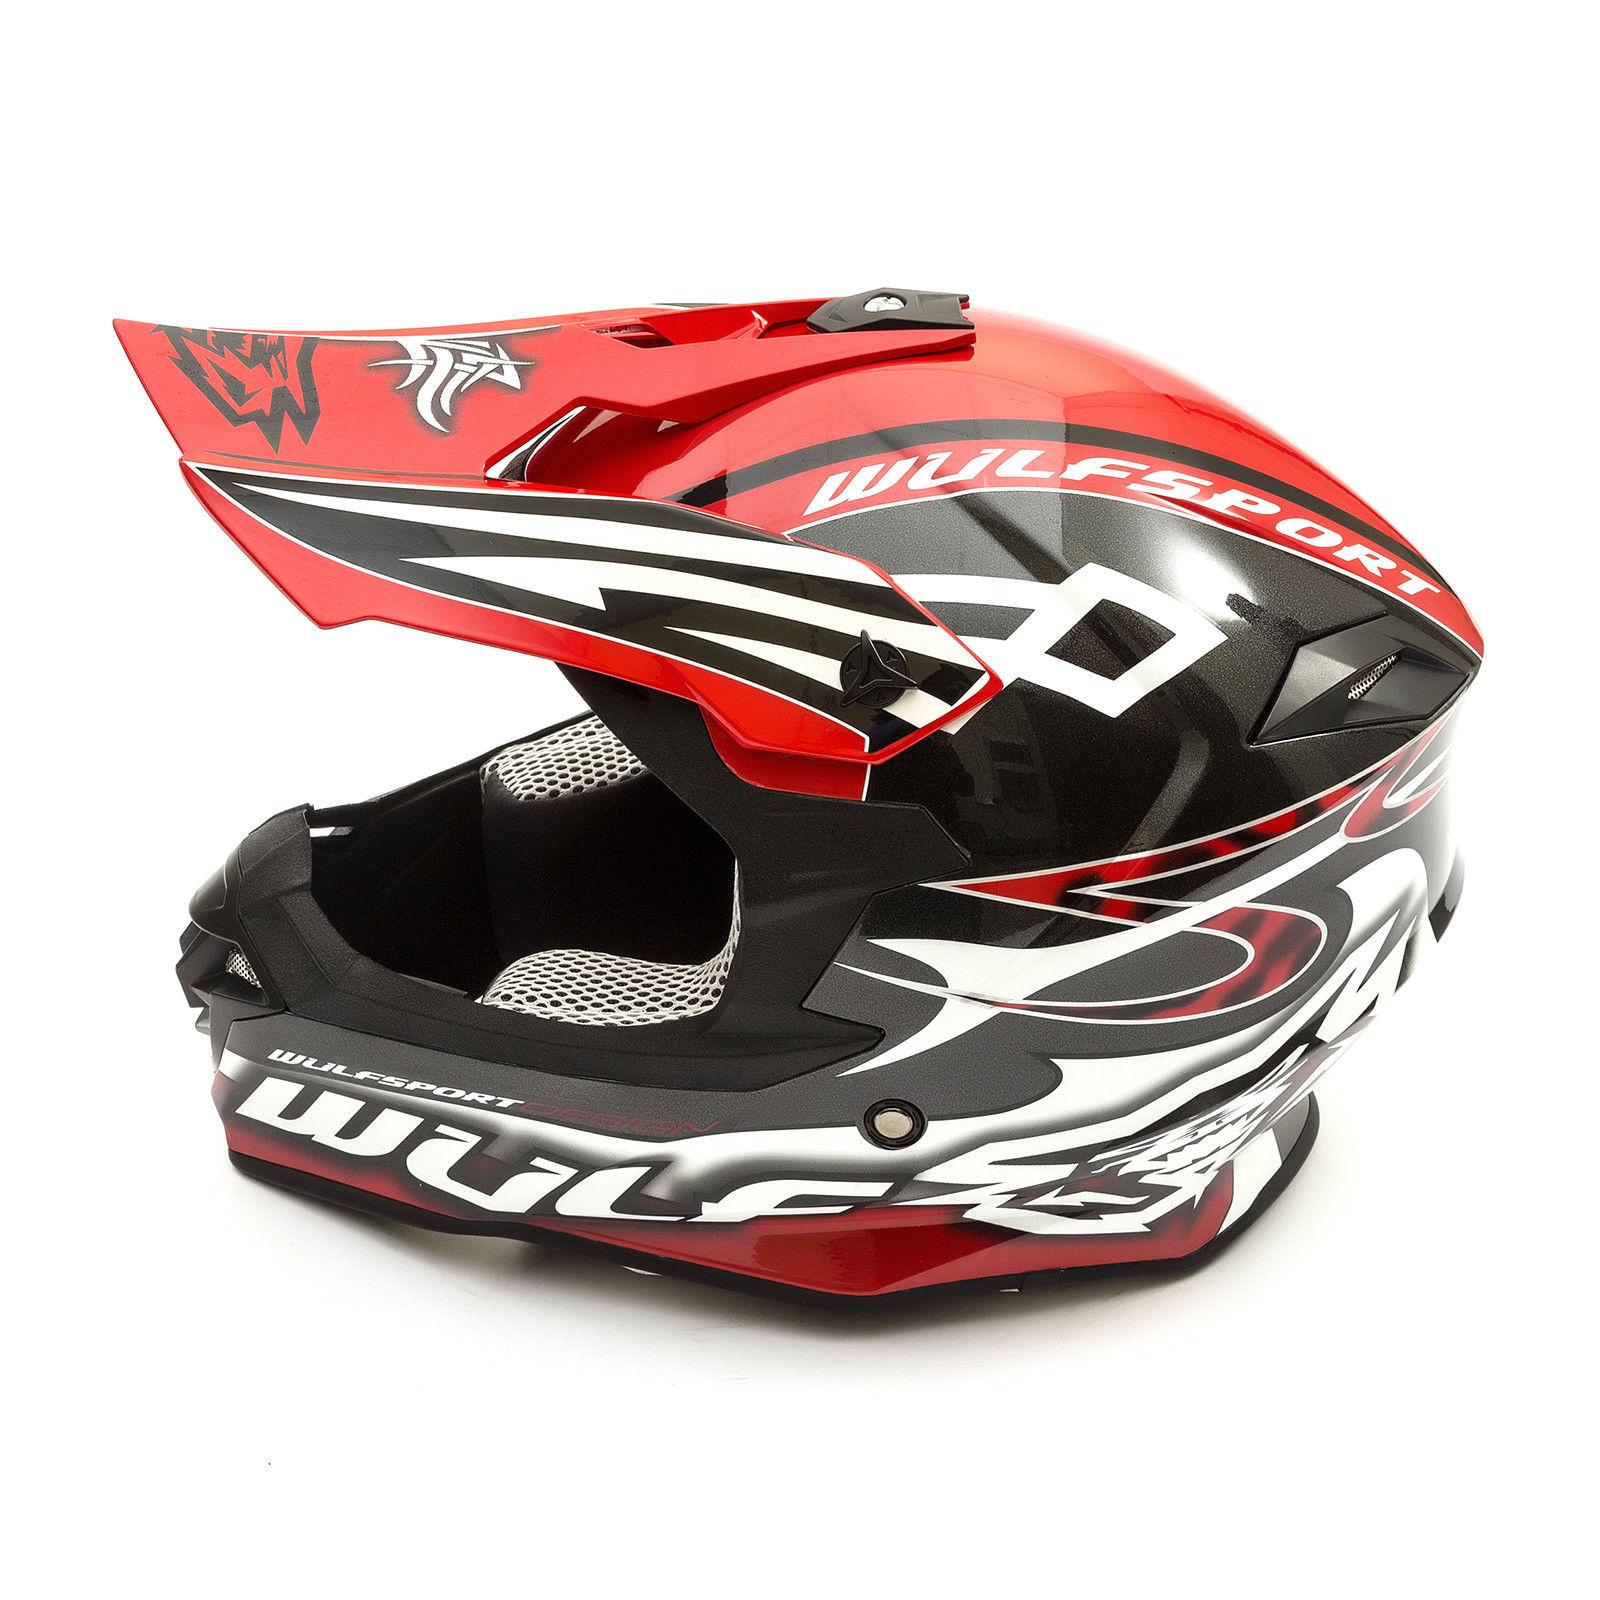 Wulfsport-Adult-Sceptre-Helmets-Motocross-Pitbike-Motorbike-Off-Road-Racing-ATV thumbnail 28